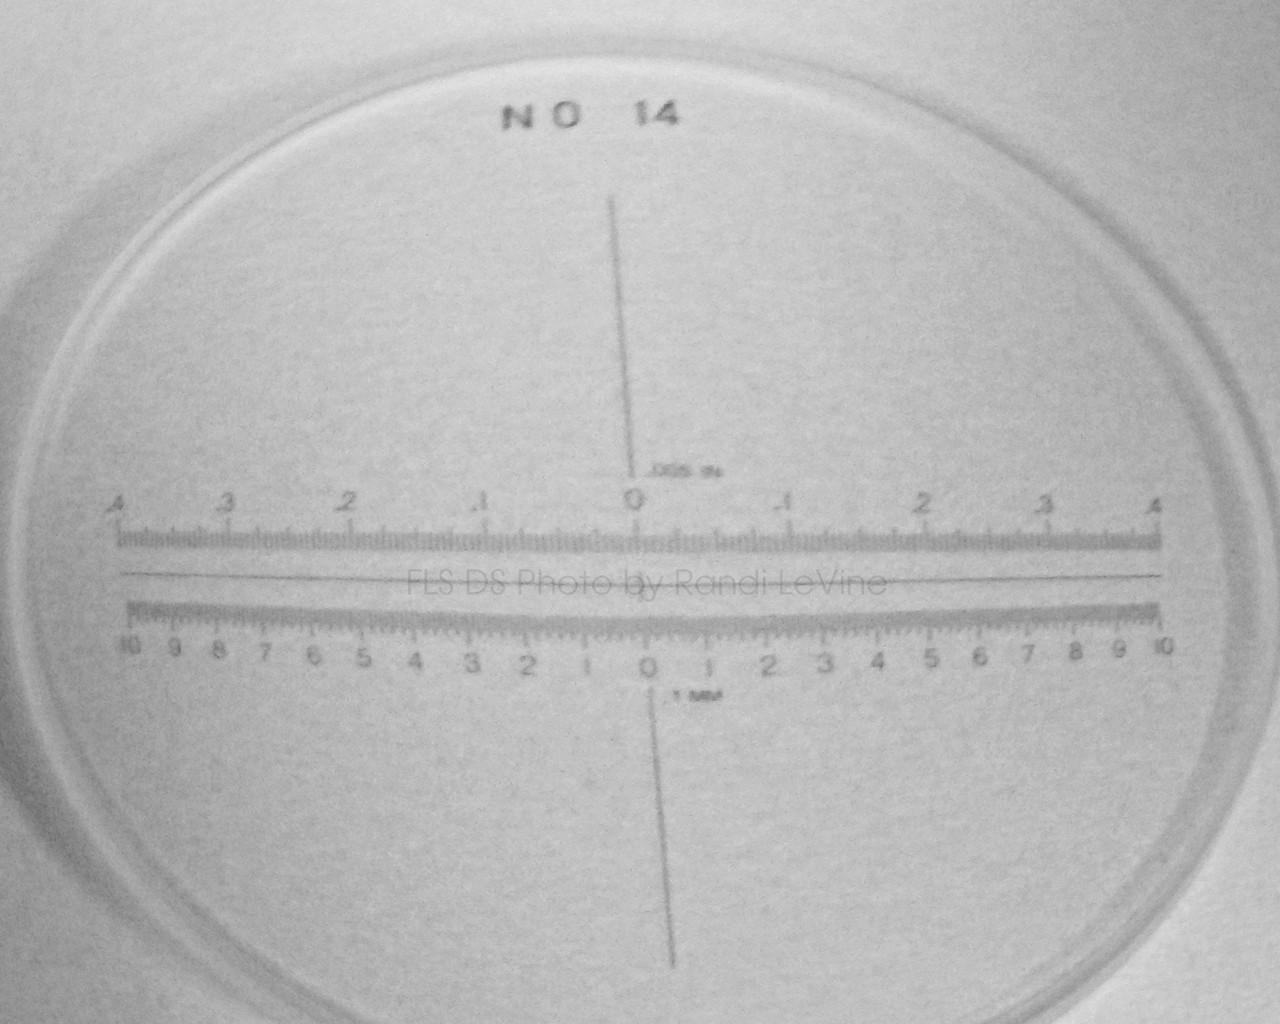 Optical Comparator Peak Scale Measurement Loupe 7 X 1975